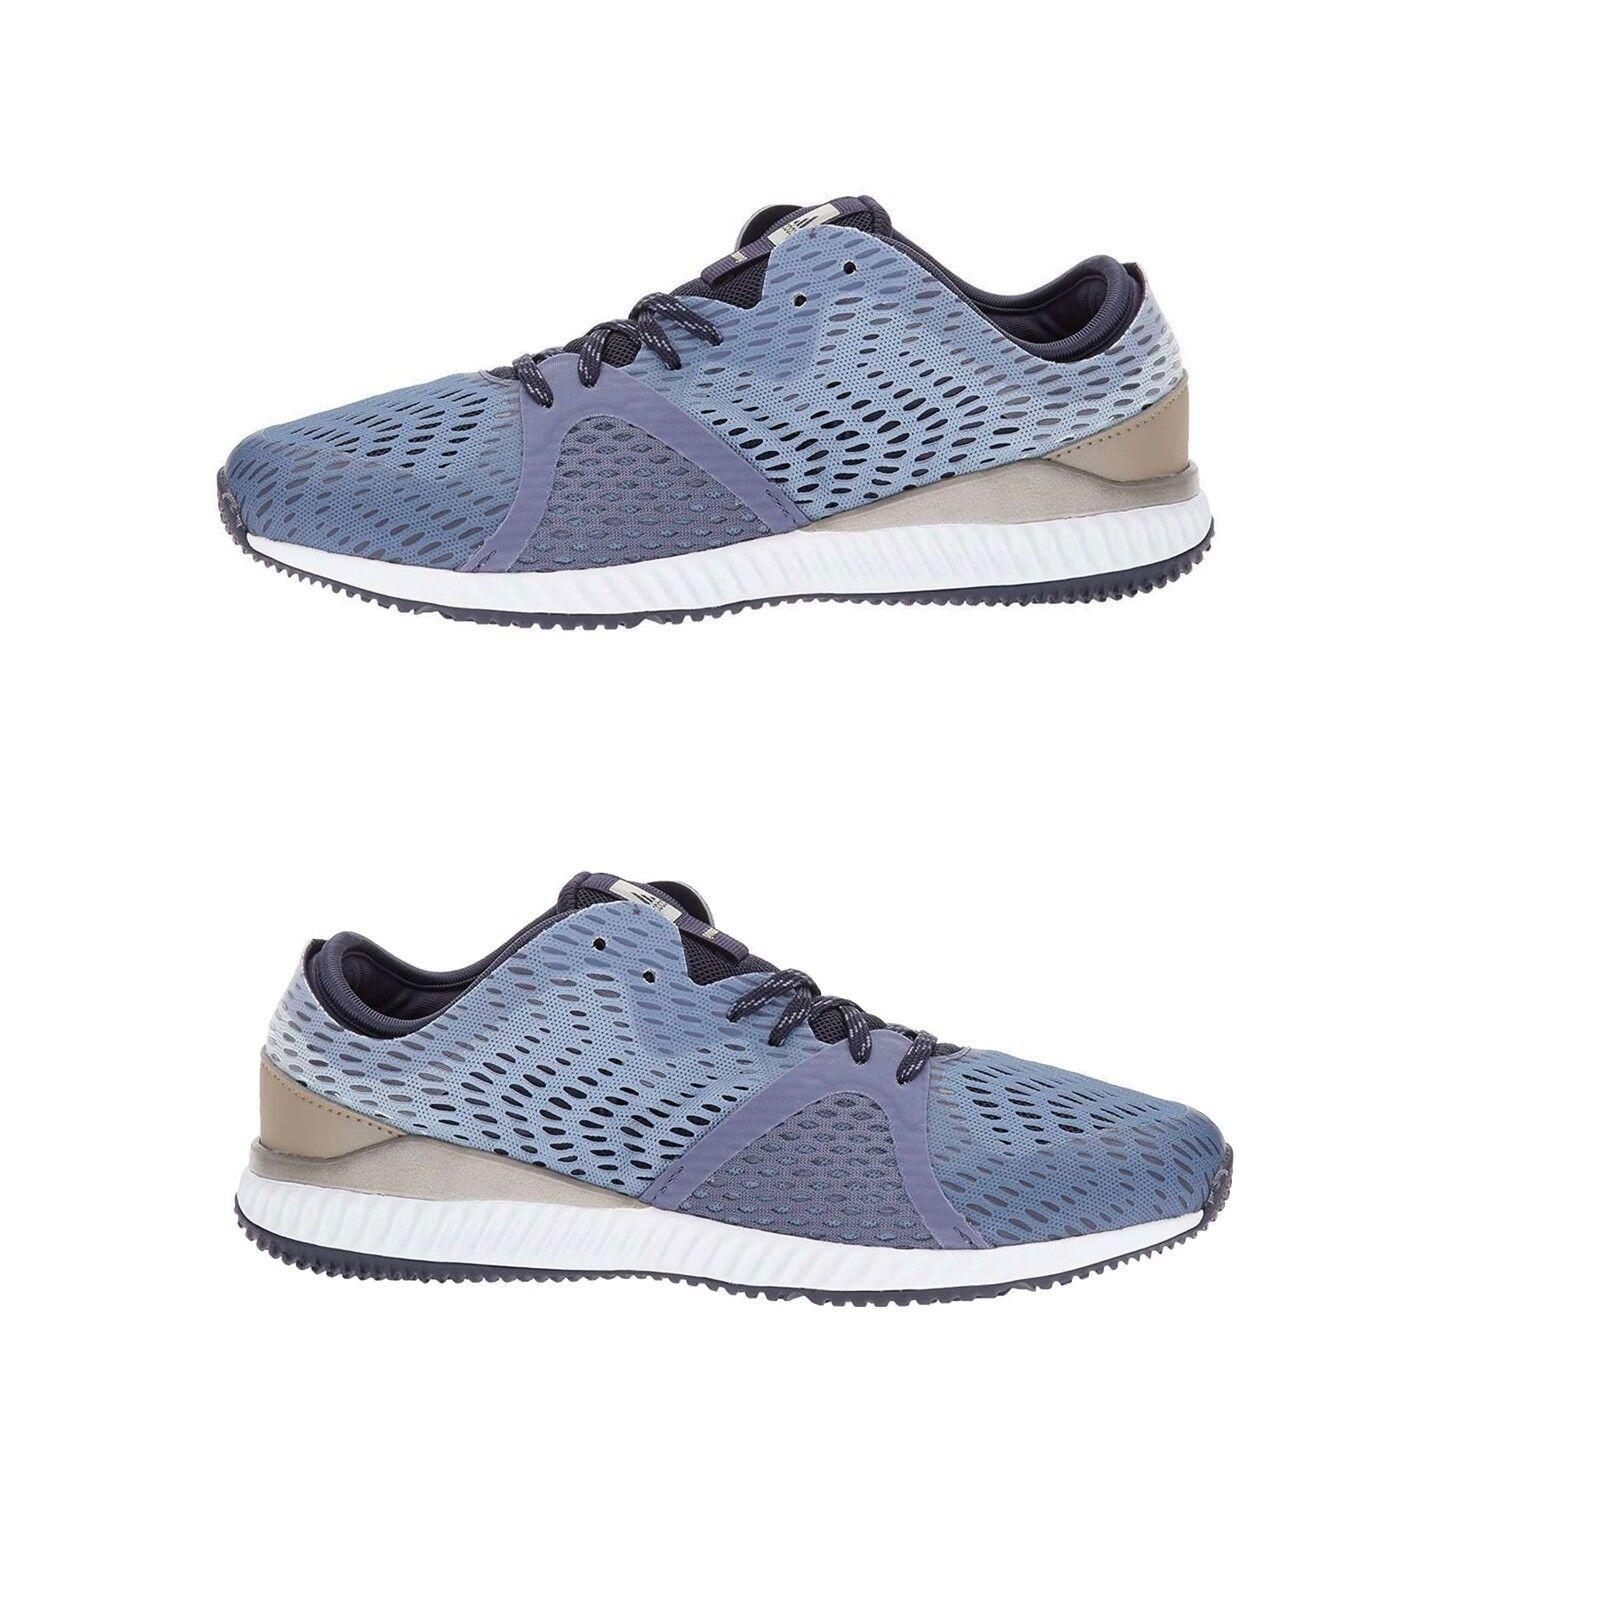 Adidas Women's Trainer CrazyTrain PRO Cross Trainer Women's Shoes NEW Sneakers 13fea2